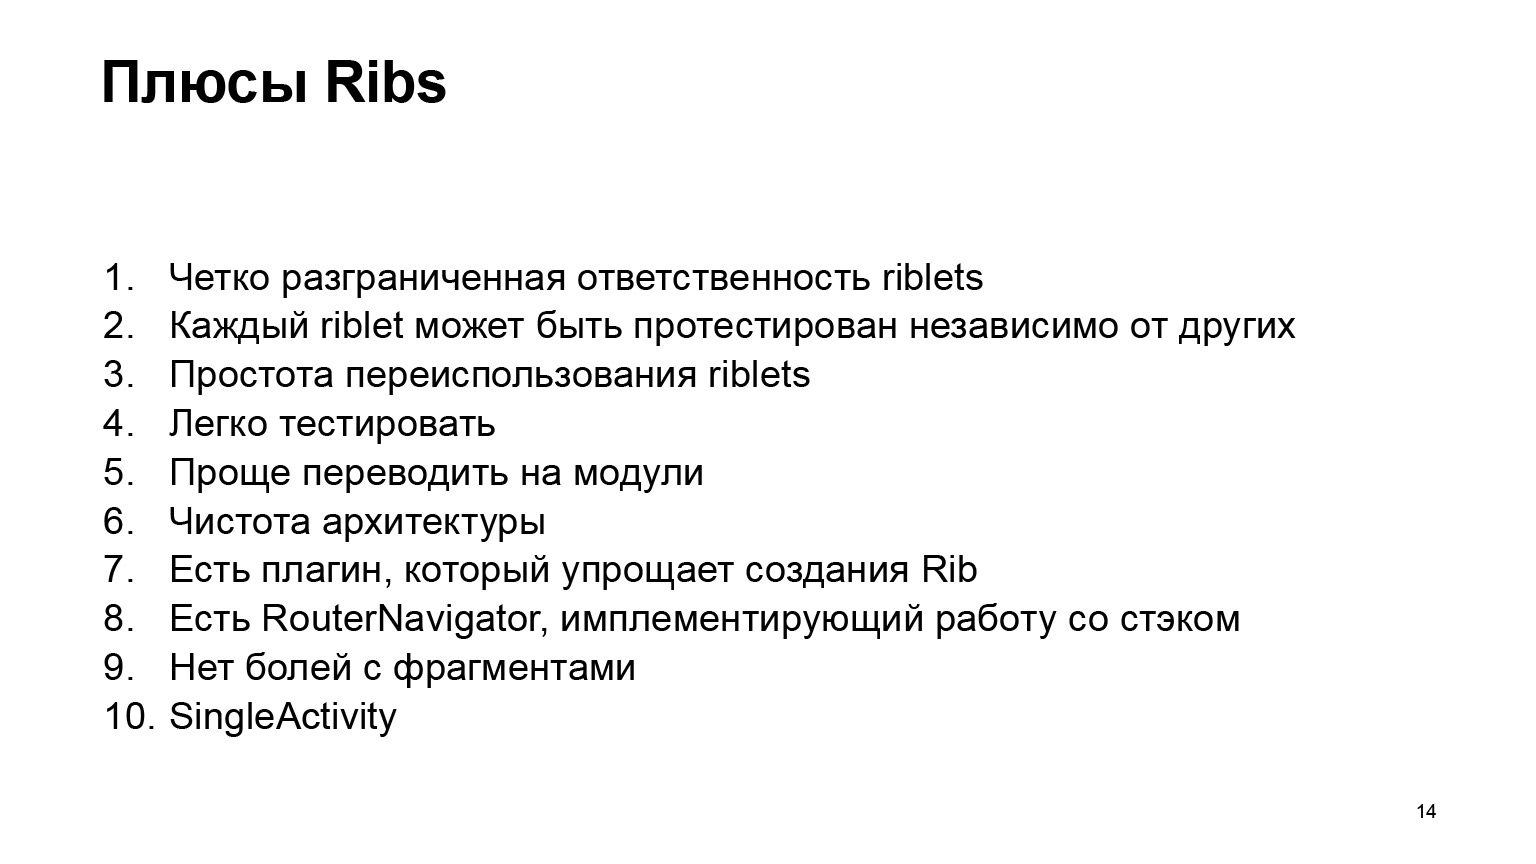 Как мы внедряли архитектуру RIBs. Доклад Яндекс.Такси - 10